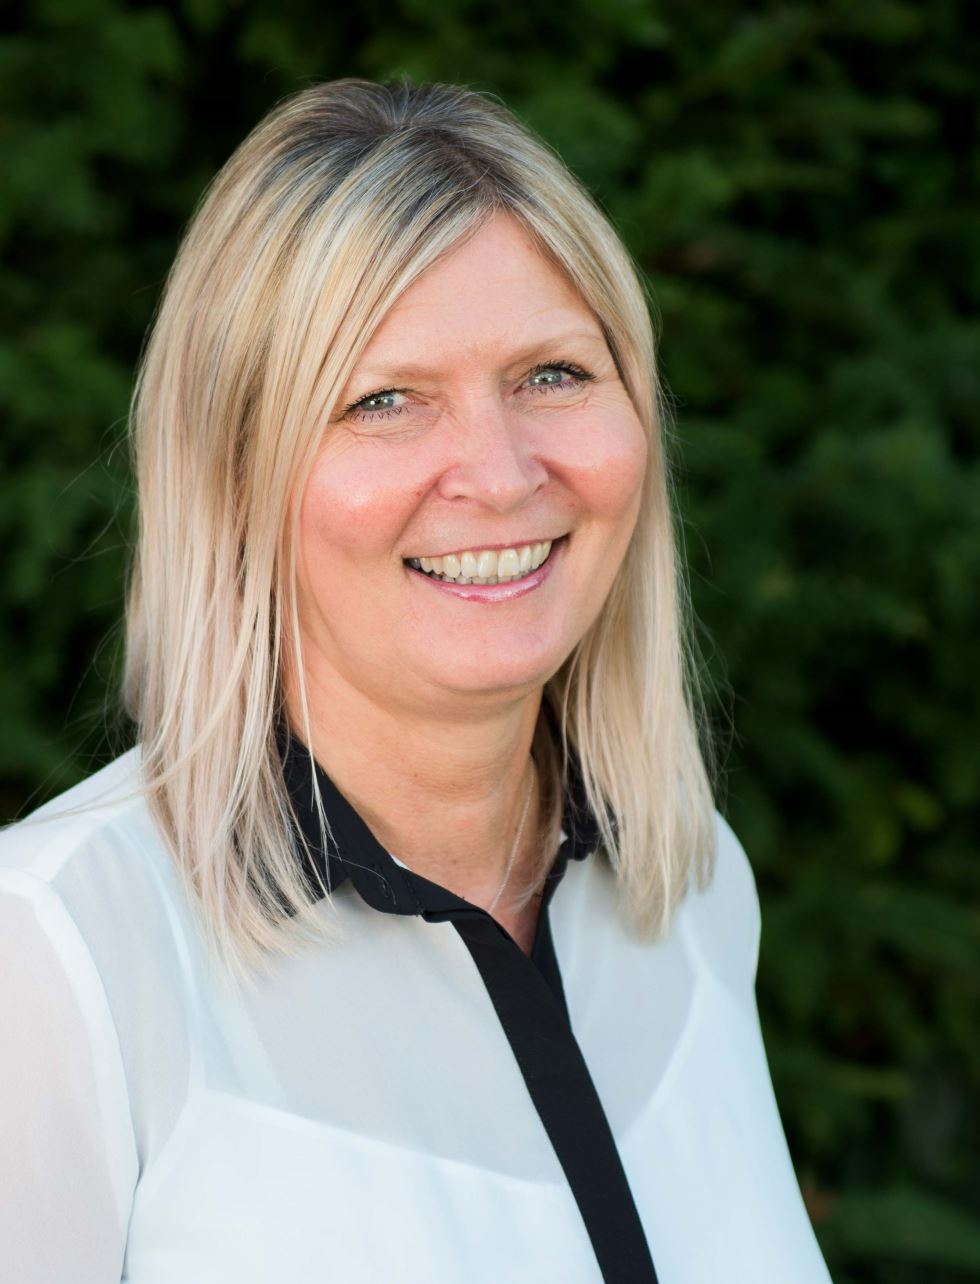 Karen Reynolds, Auto Enrolment Administrator